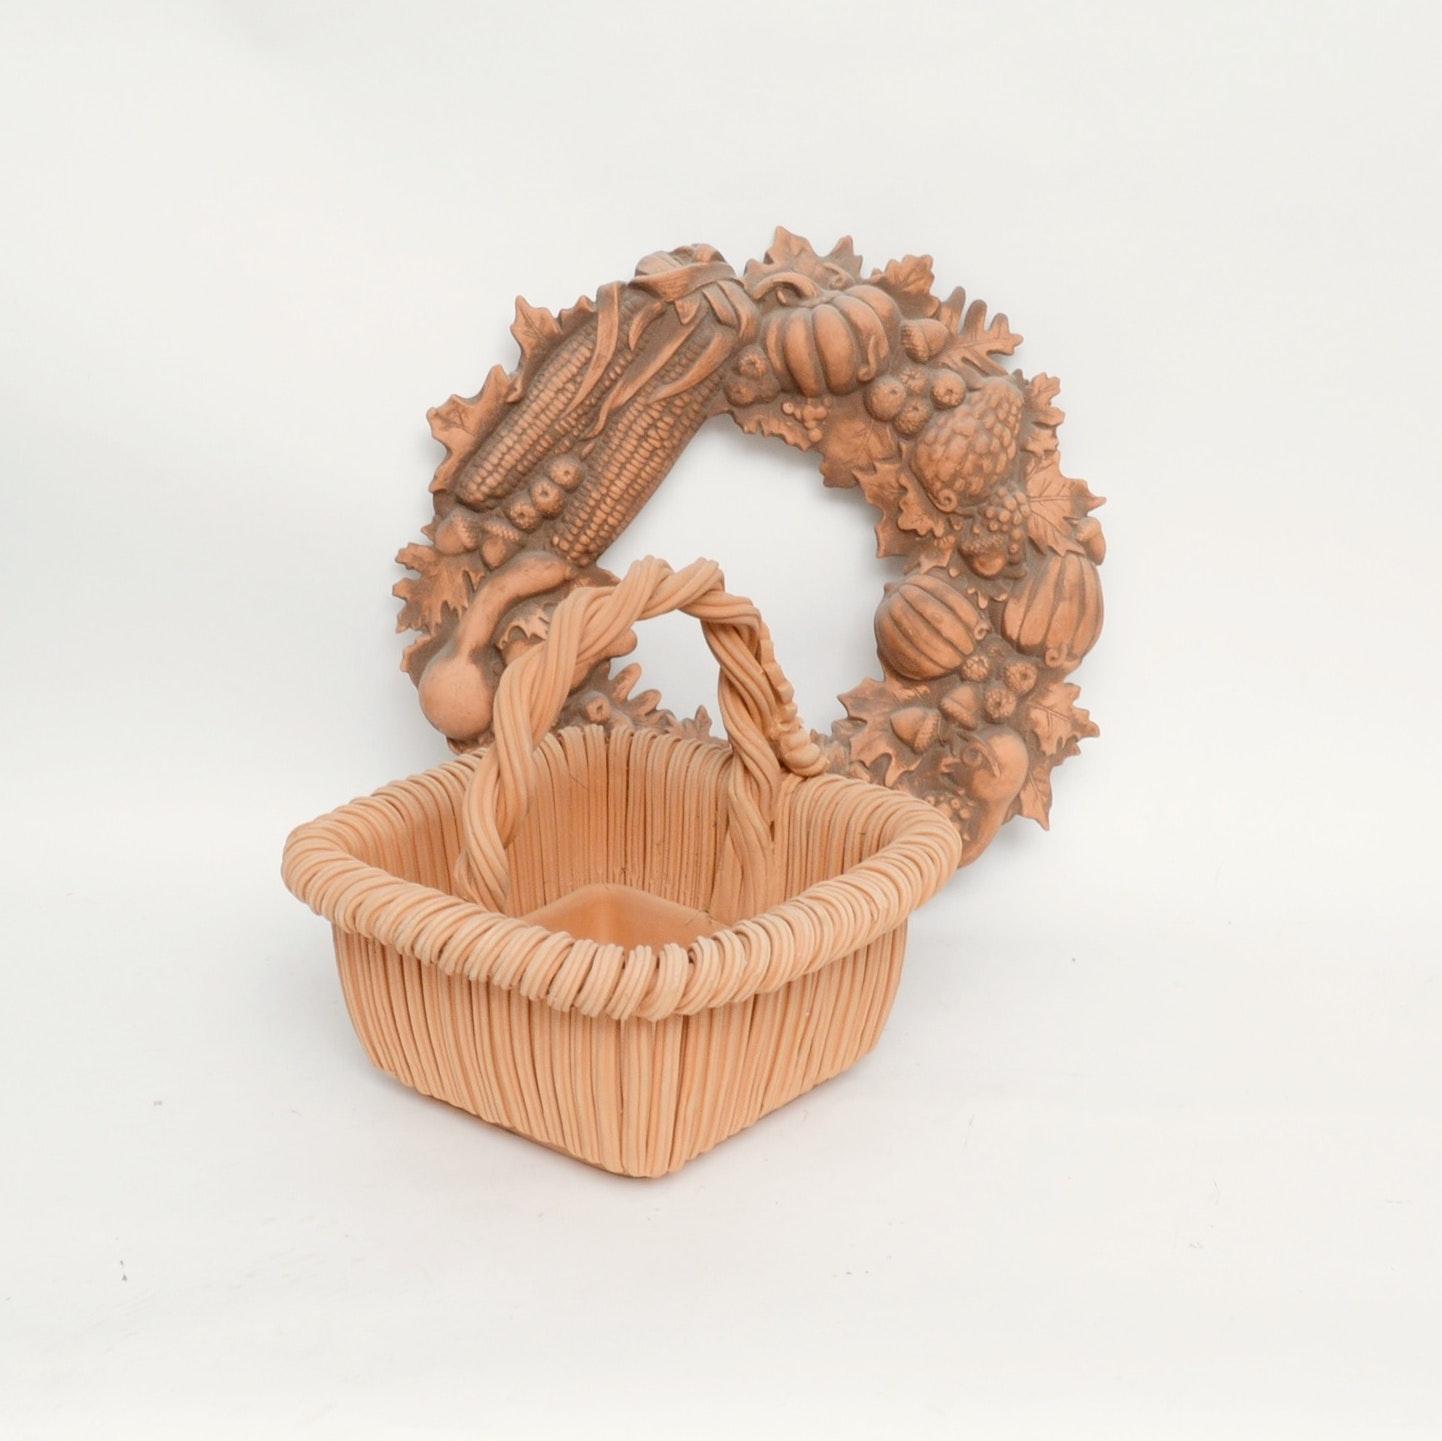 Terra Cotta Wreath and Basket